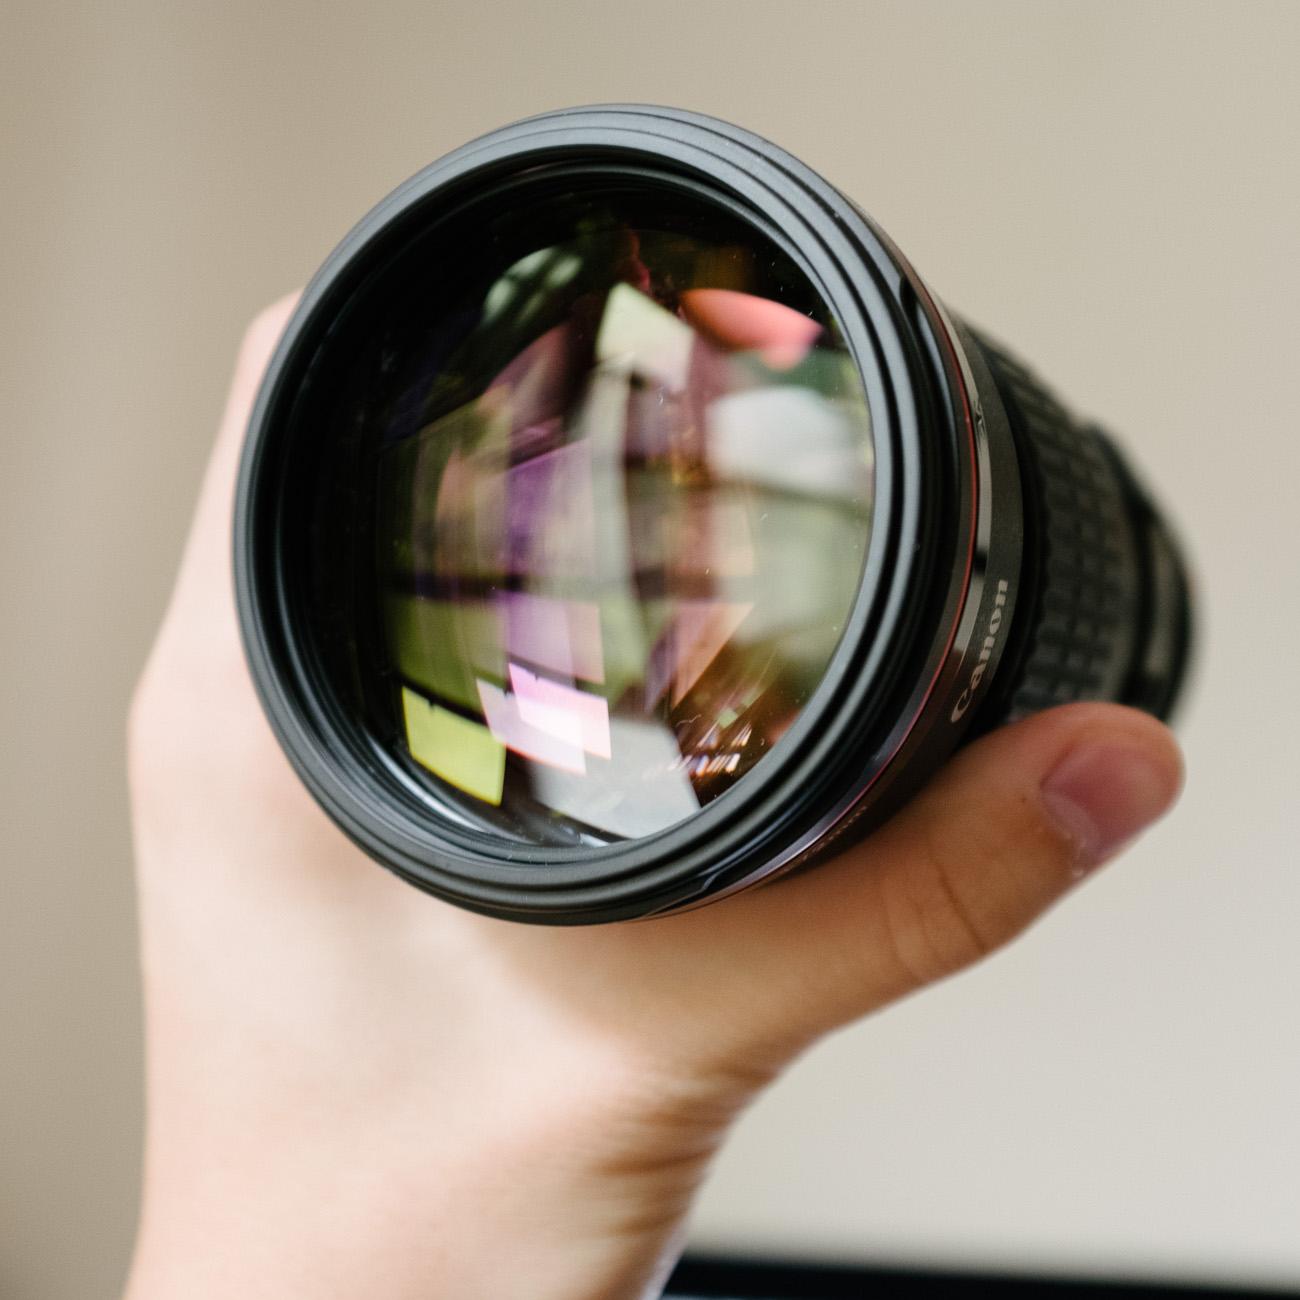 canon-200-2.8-lens-review-full-frame-l-series-product-3.jpg